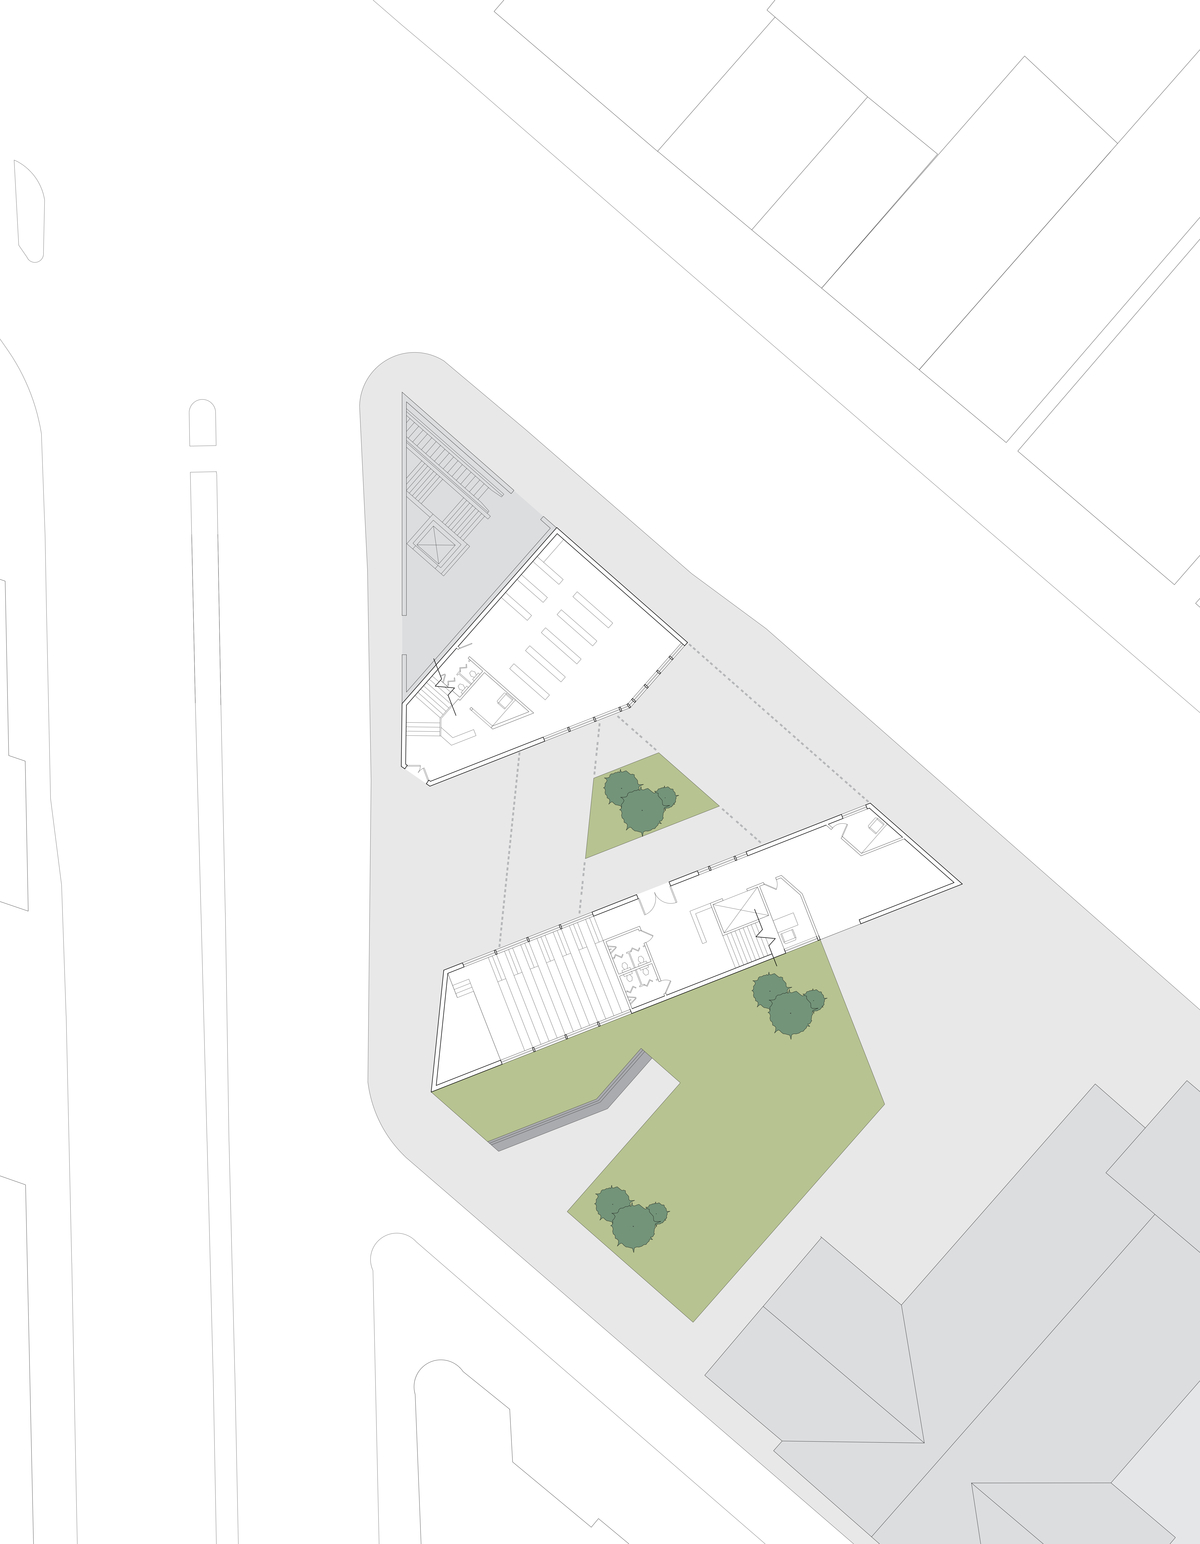 First Floor & Site Plan